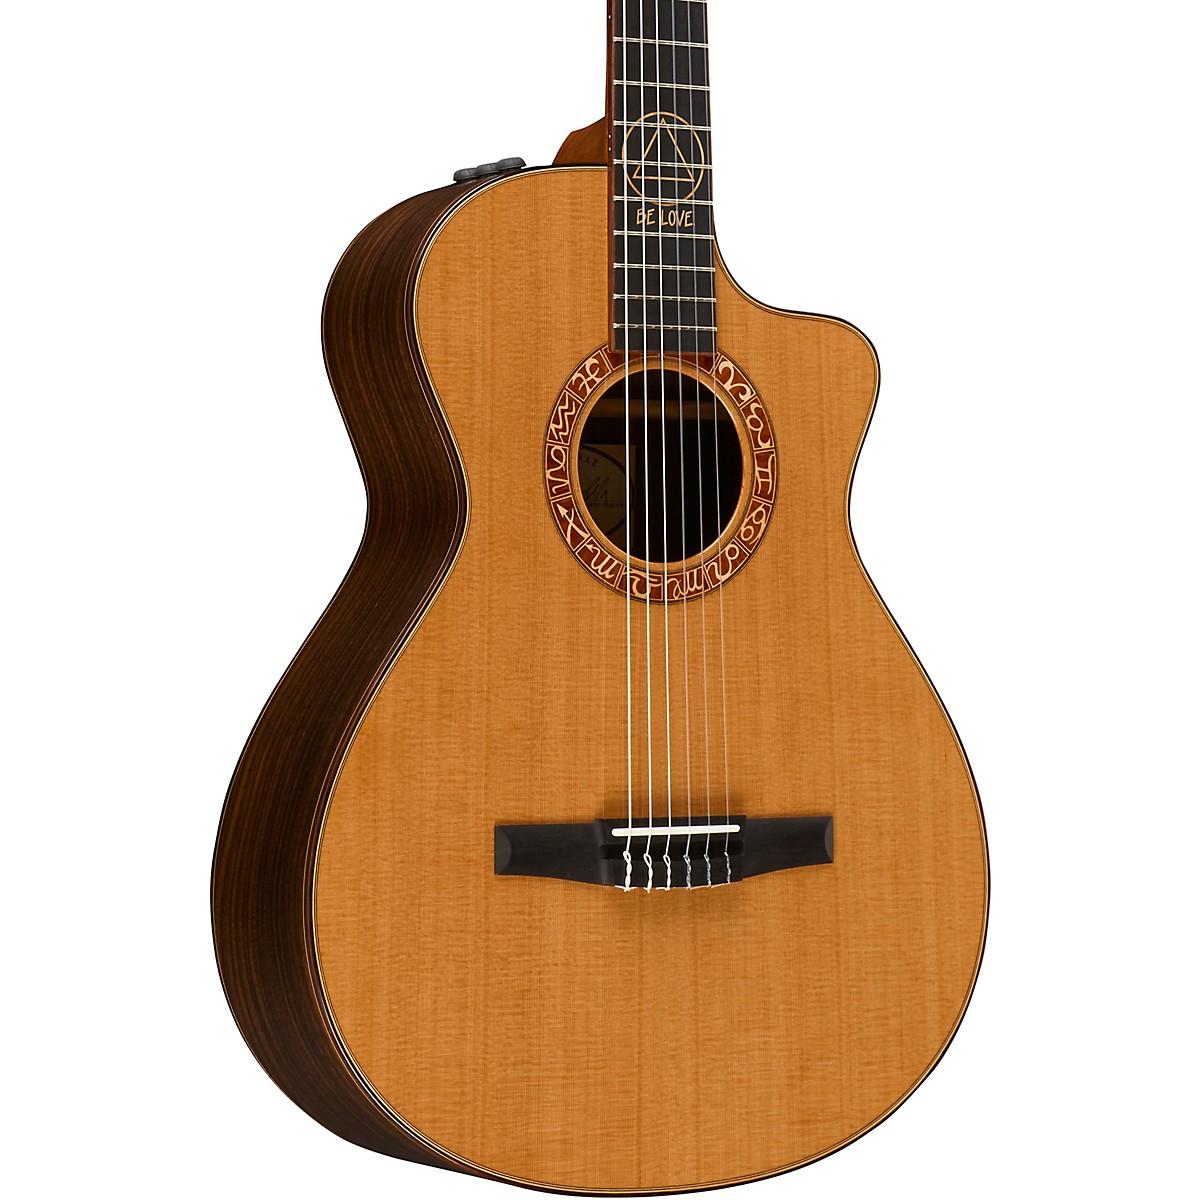 Taylor JMSM Jason Mraz Signature Model Grand Concert Acoustic-Electric Guitar